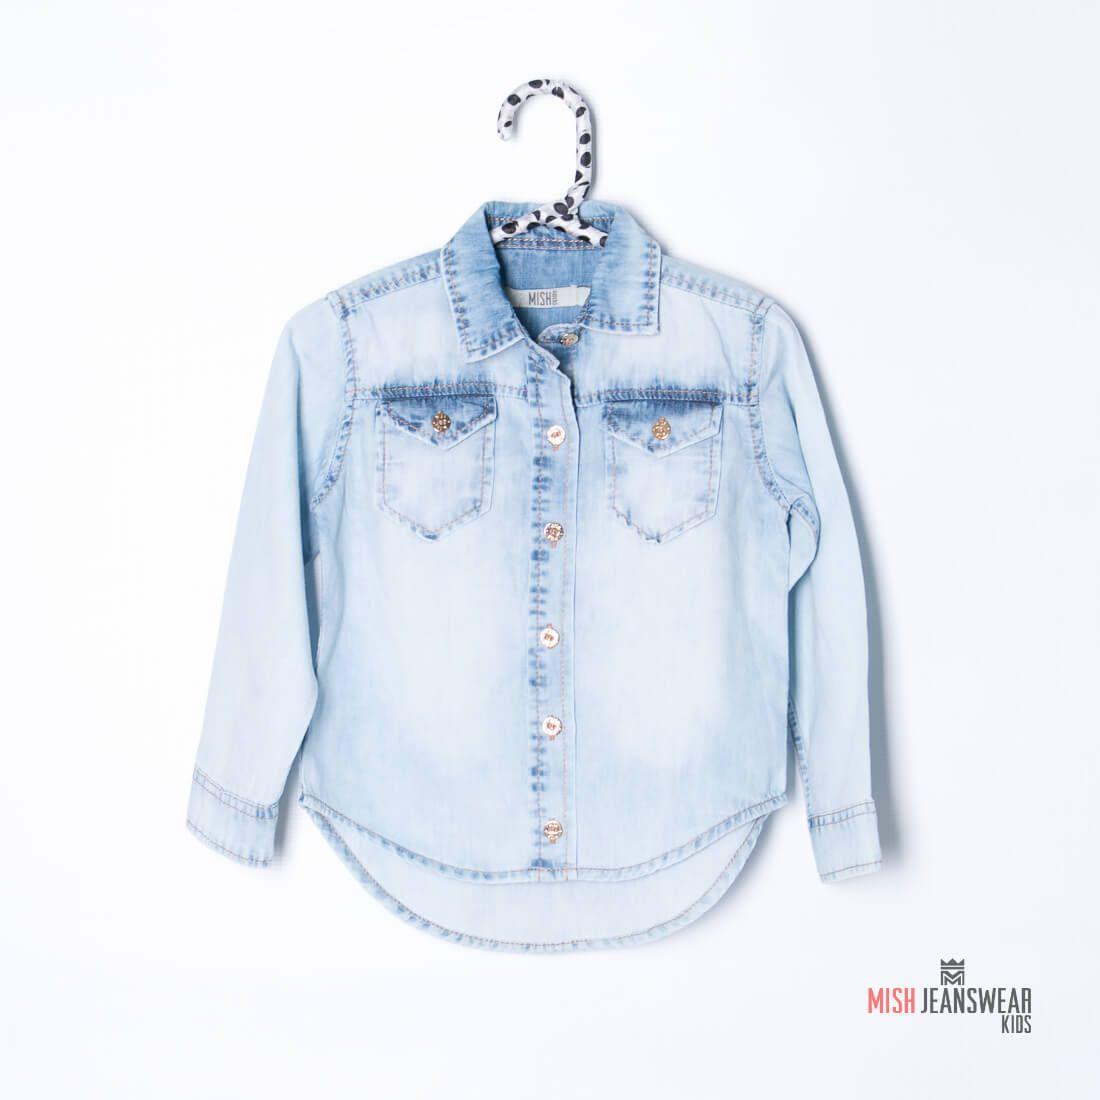 Camisa jeans infantil Mish feminina